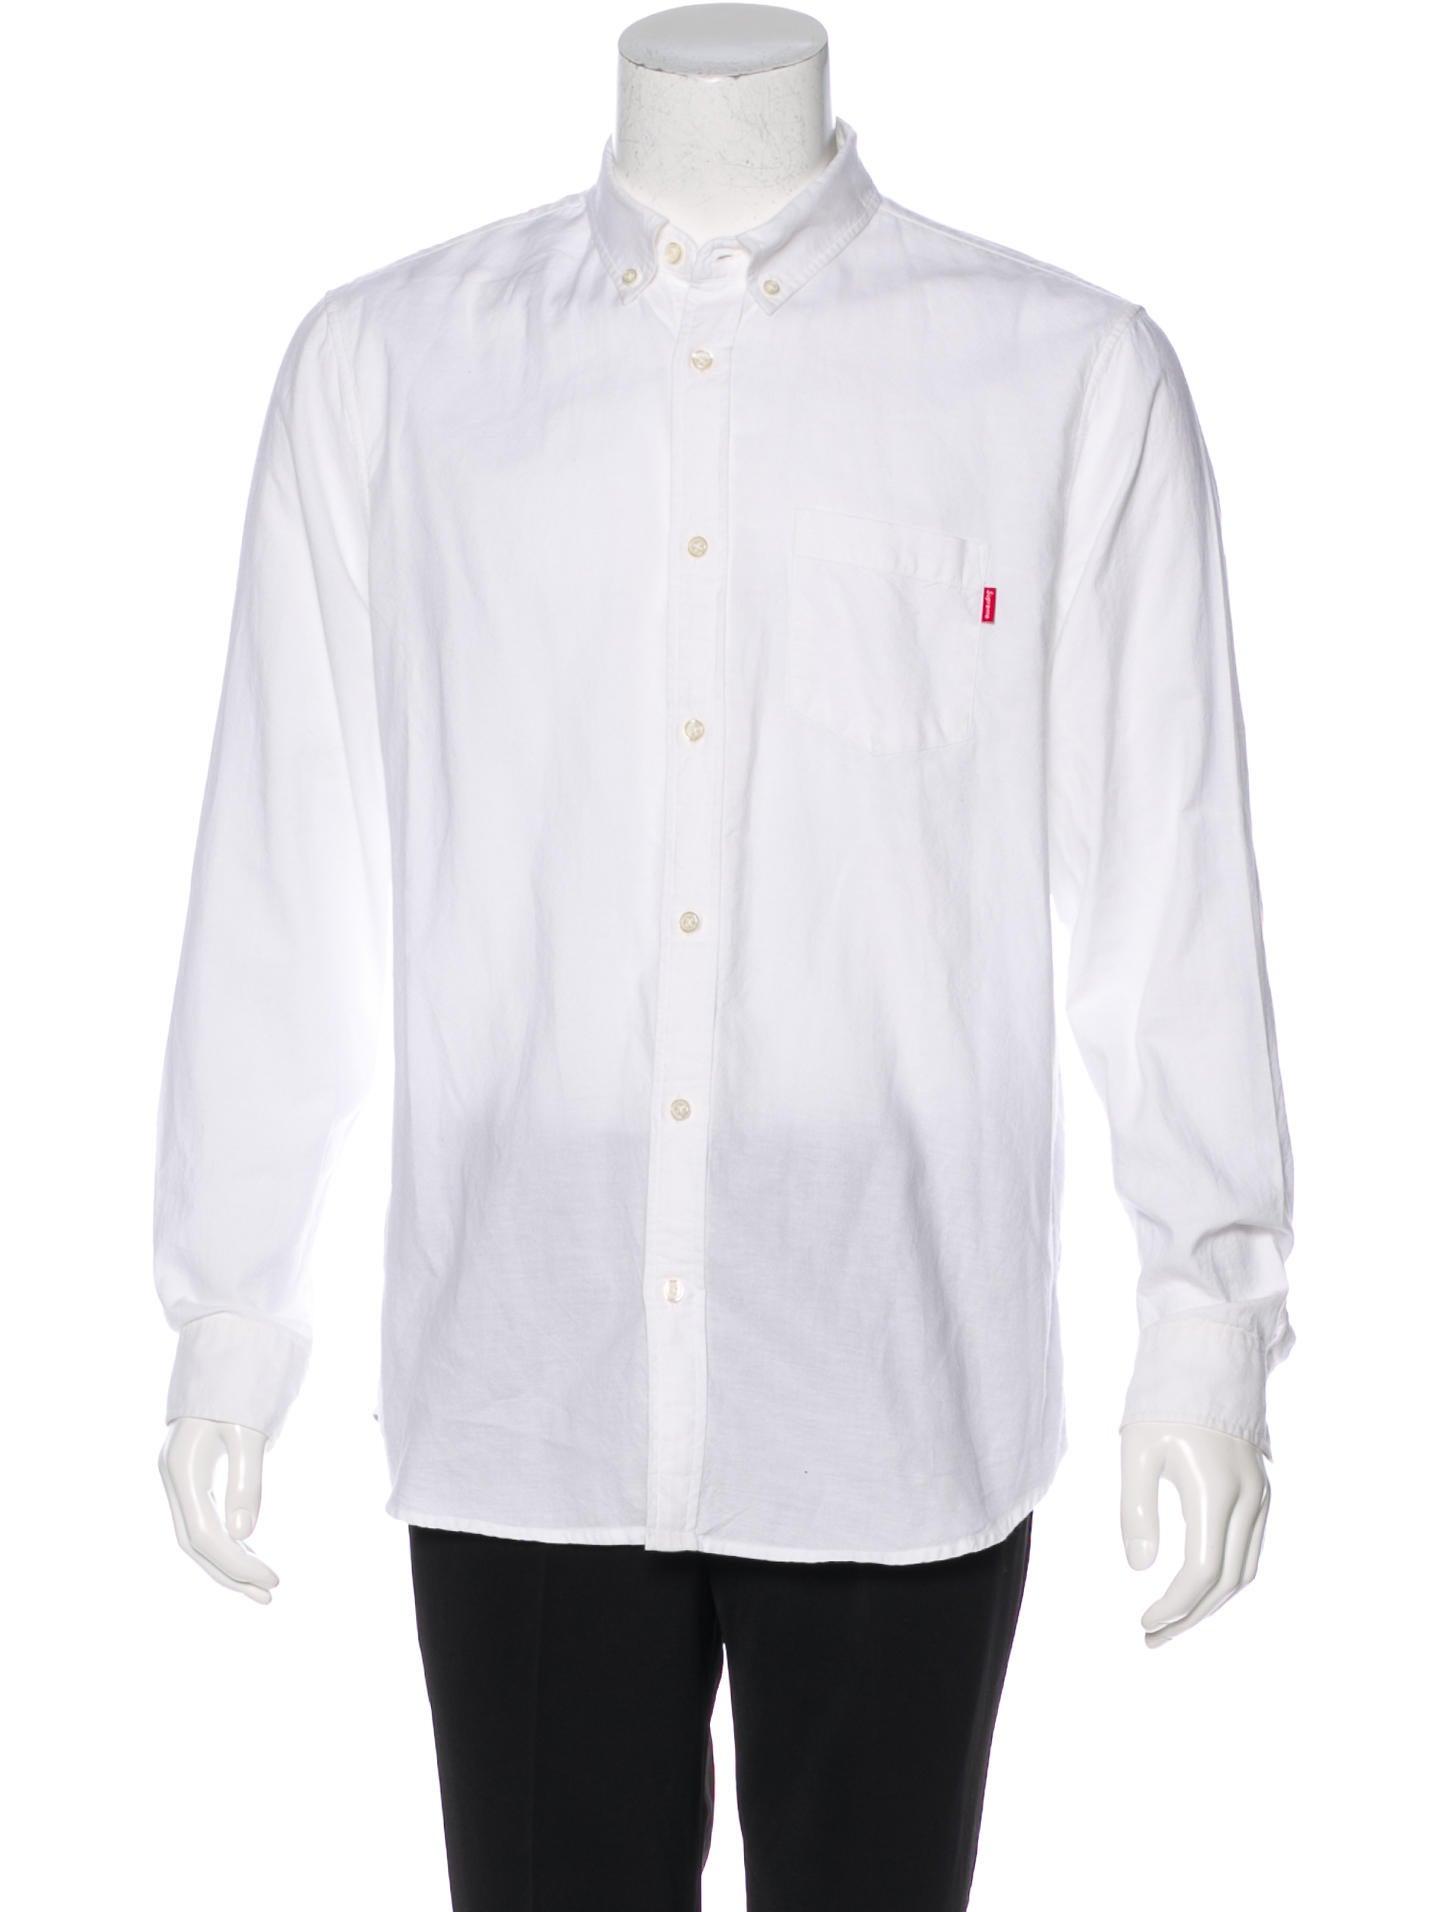 f92ff79f64b31b Supreme 2017 Oxford Button-Up Shirt - Clothing - WSPME21402 | The ...